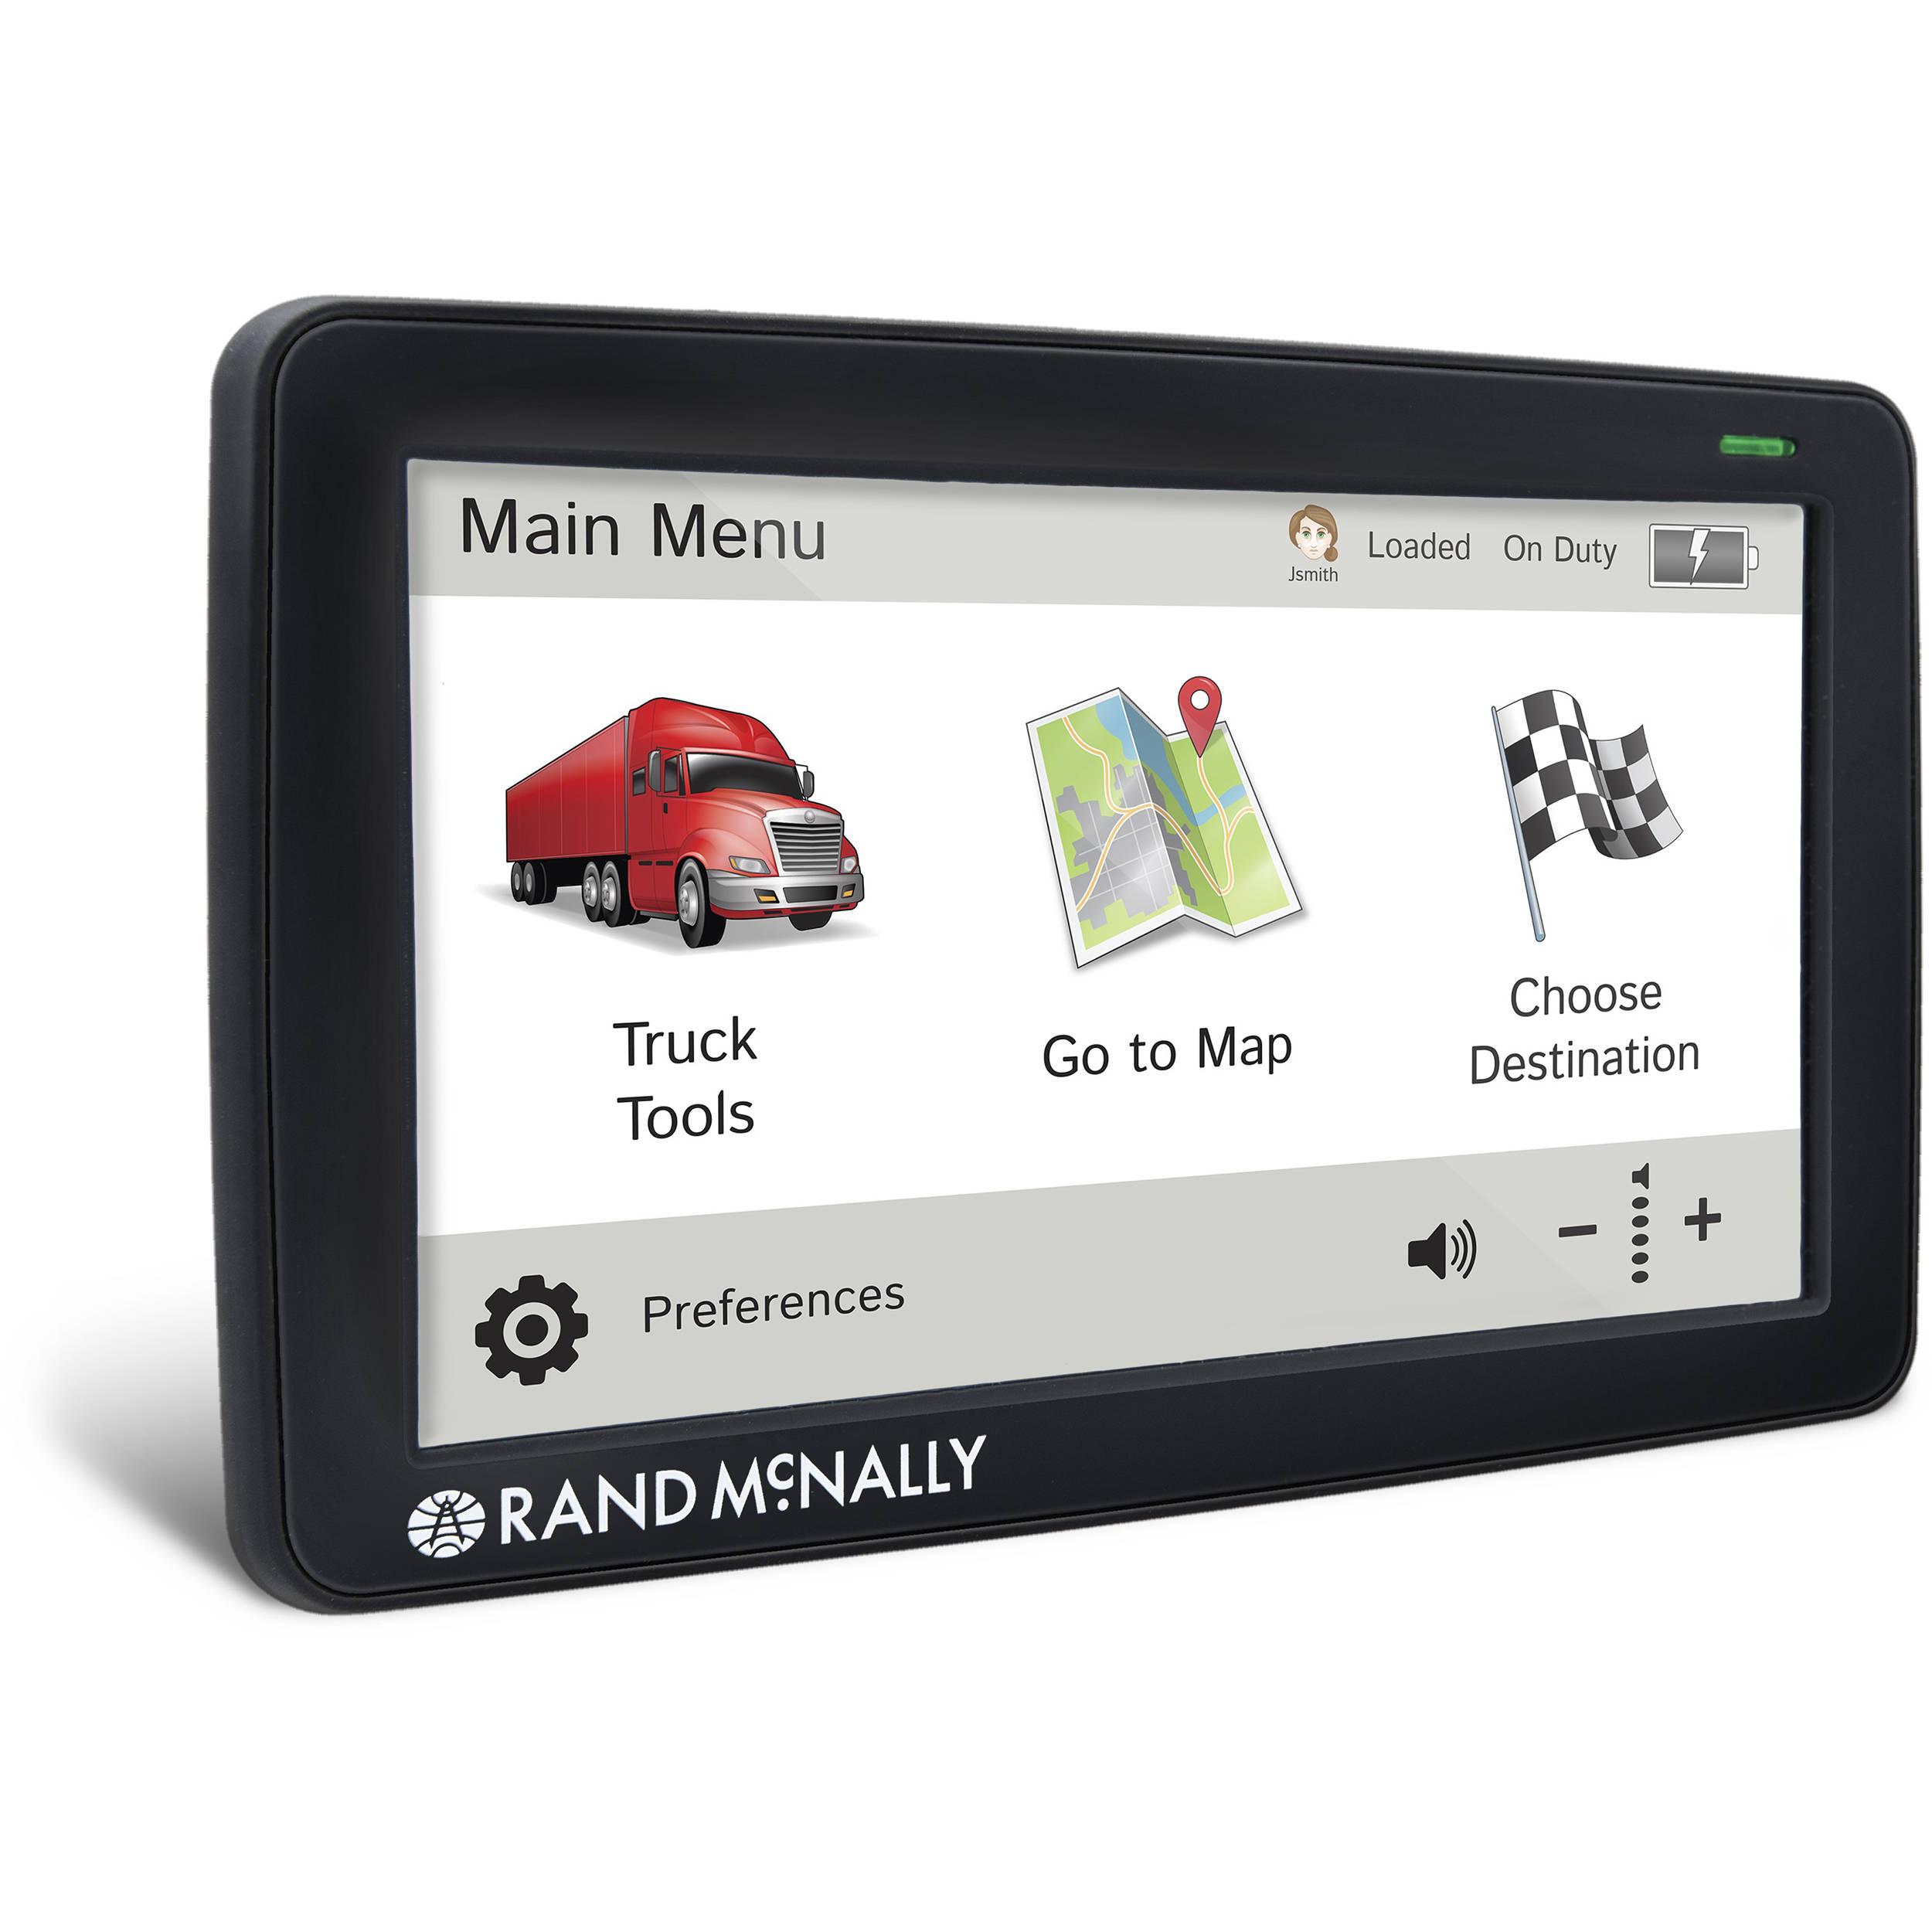 Rand Mcnally Gps >> Rand Mcnally Intelliroute Tnd 730 Lm Gps Device